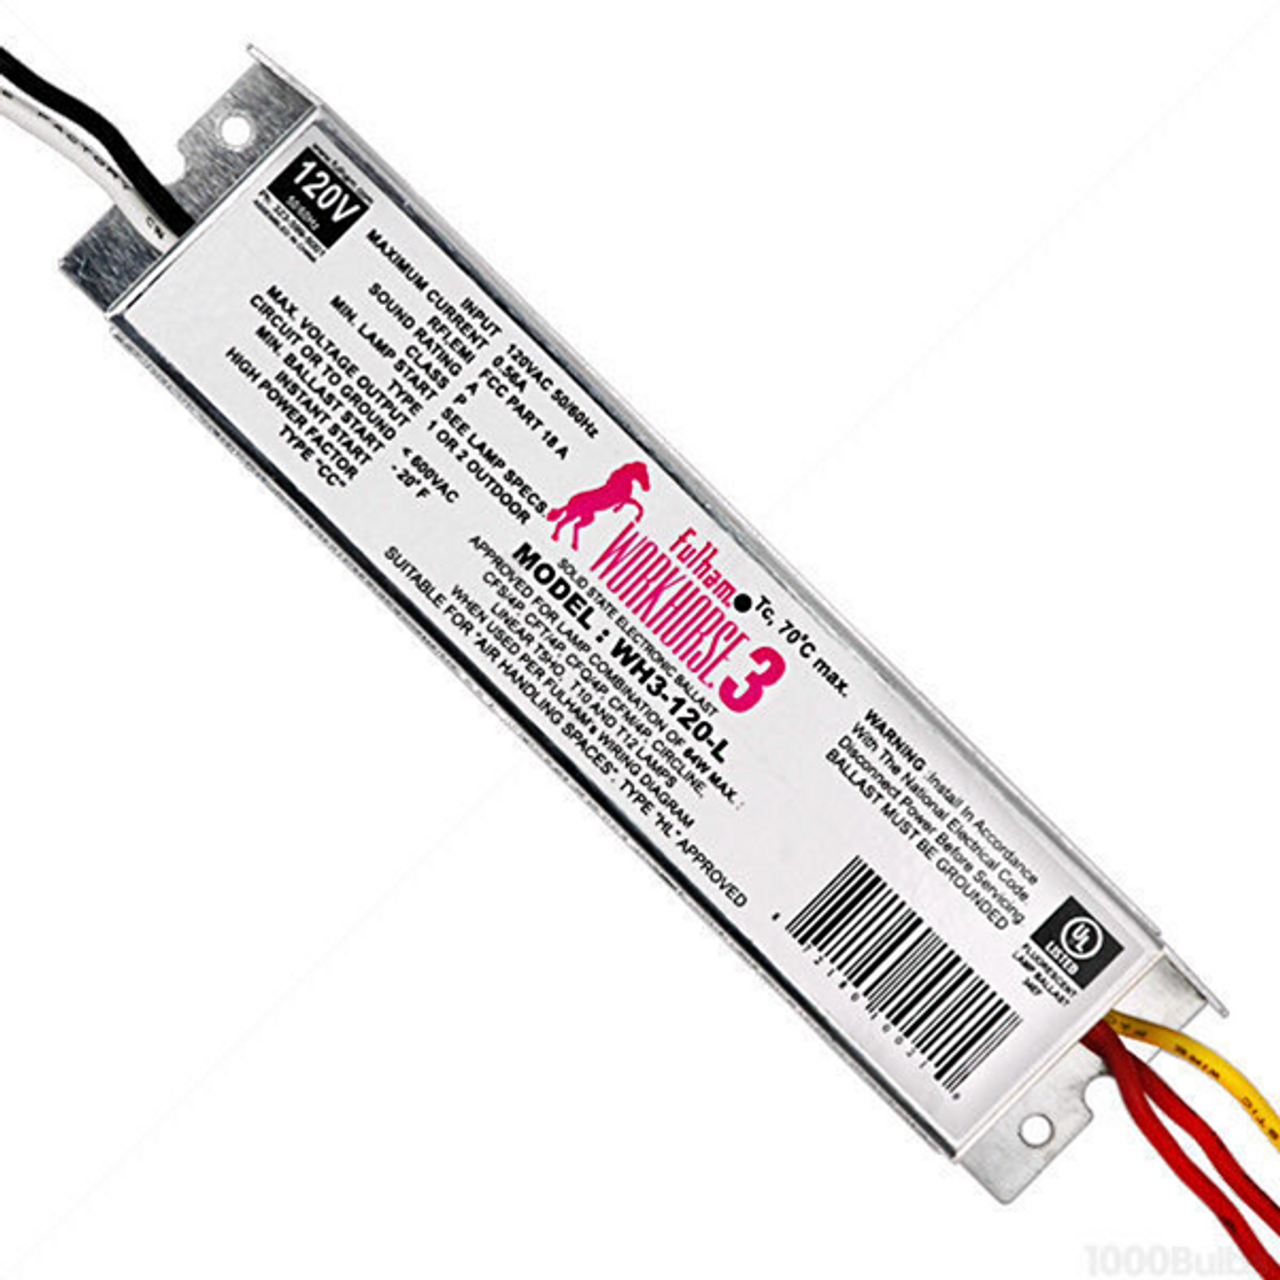 fulham workhorse wh3 120 l electronic fluorescent ballast 120 voltfulham wh3 120 l workhorse electronic fluorescent ballast 120 volt